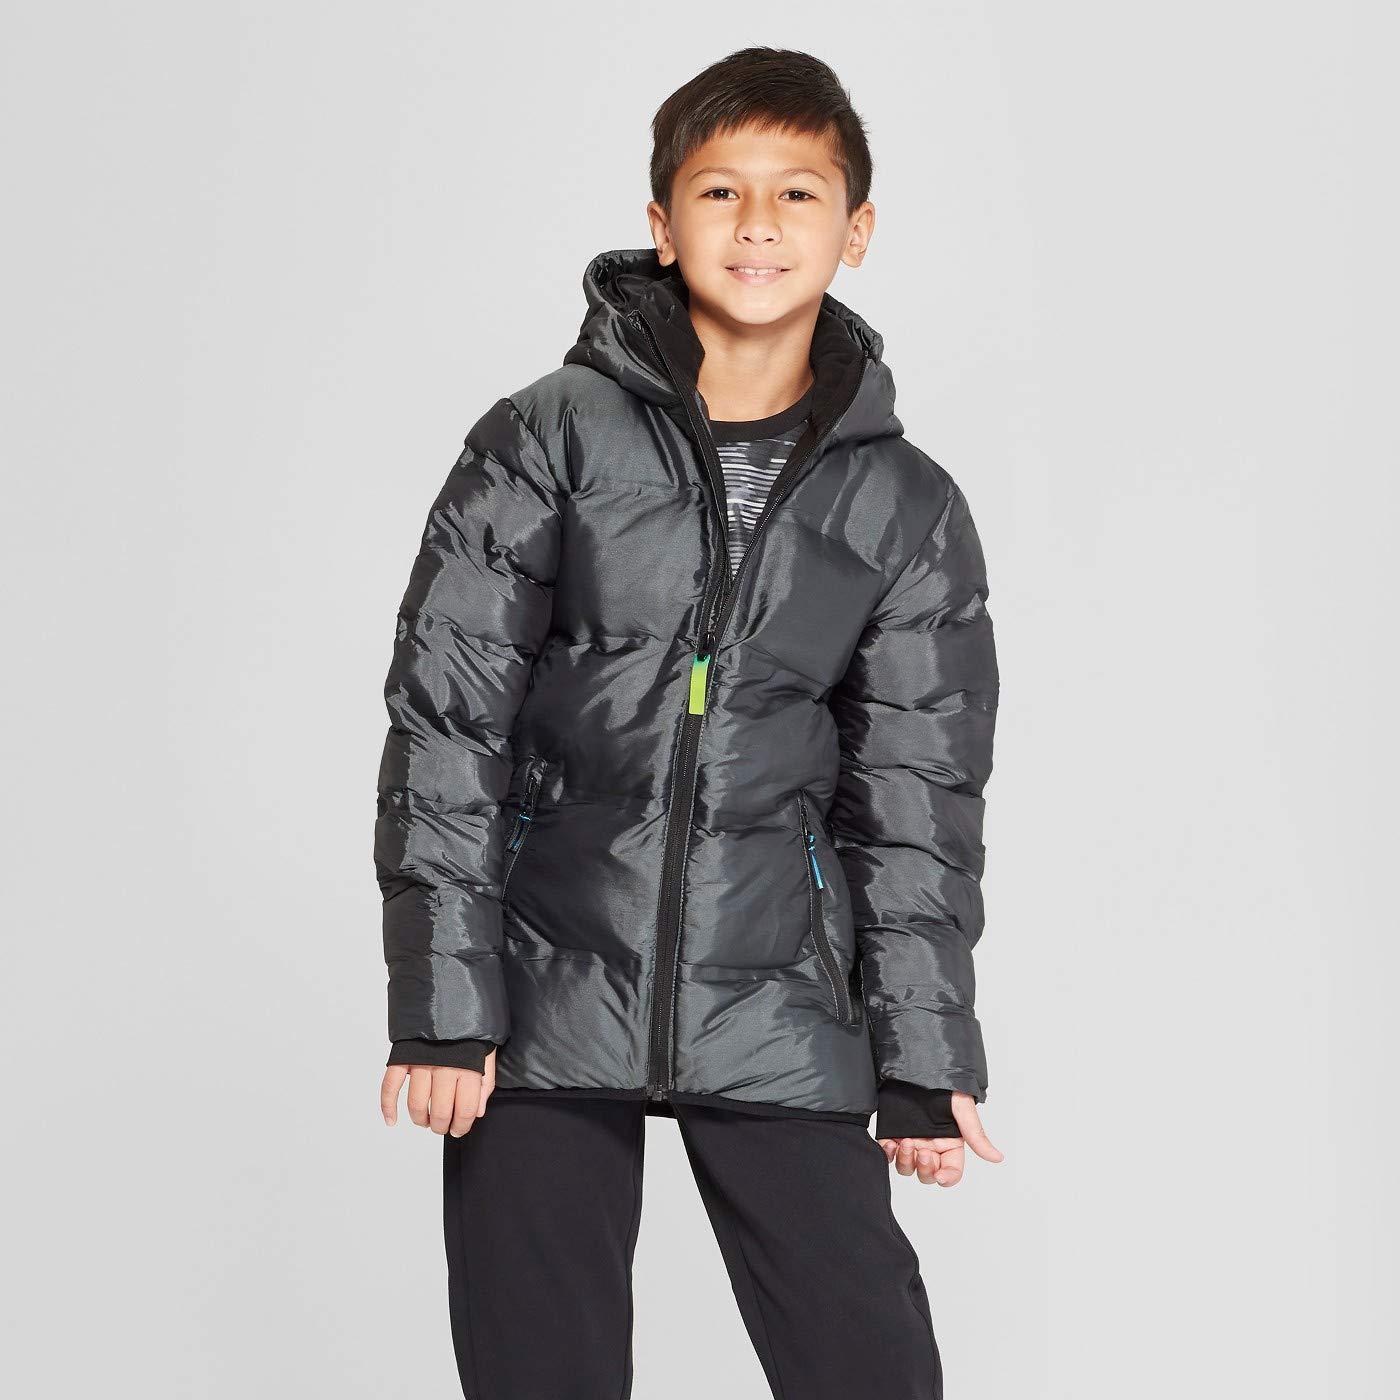 Black Boys Winter Hooded Puffer Jacket Hand Warmers Warmest Lightweight Coat by C9 CHAMPION 4-5 Size XS